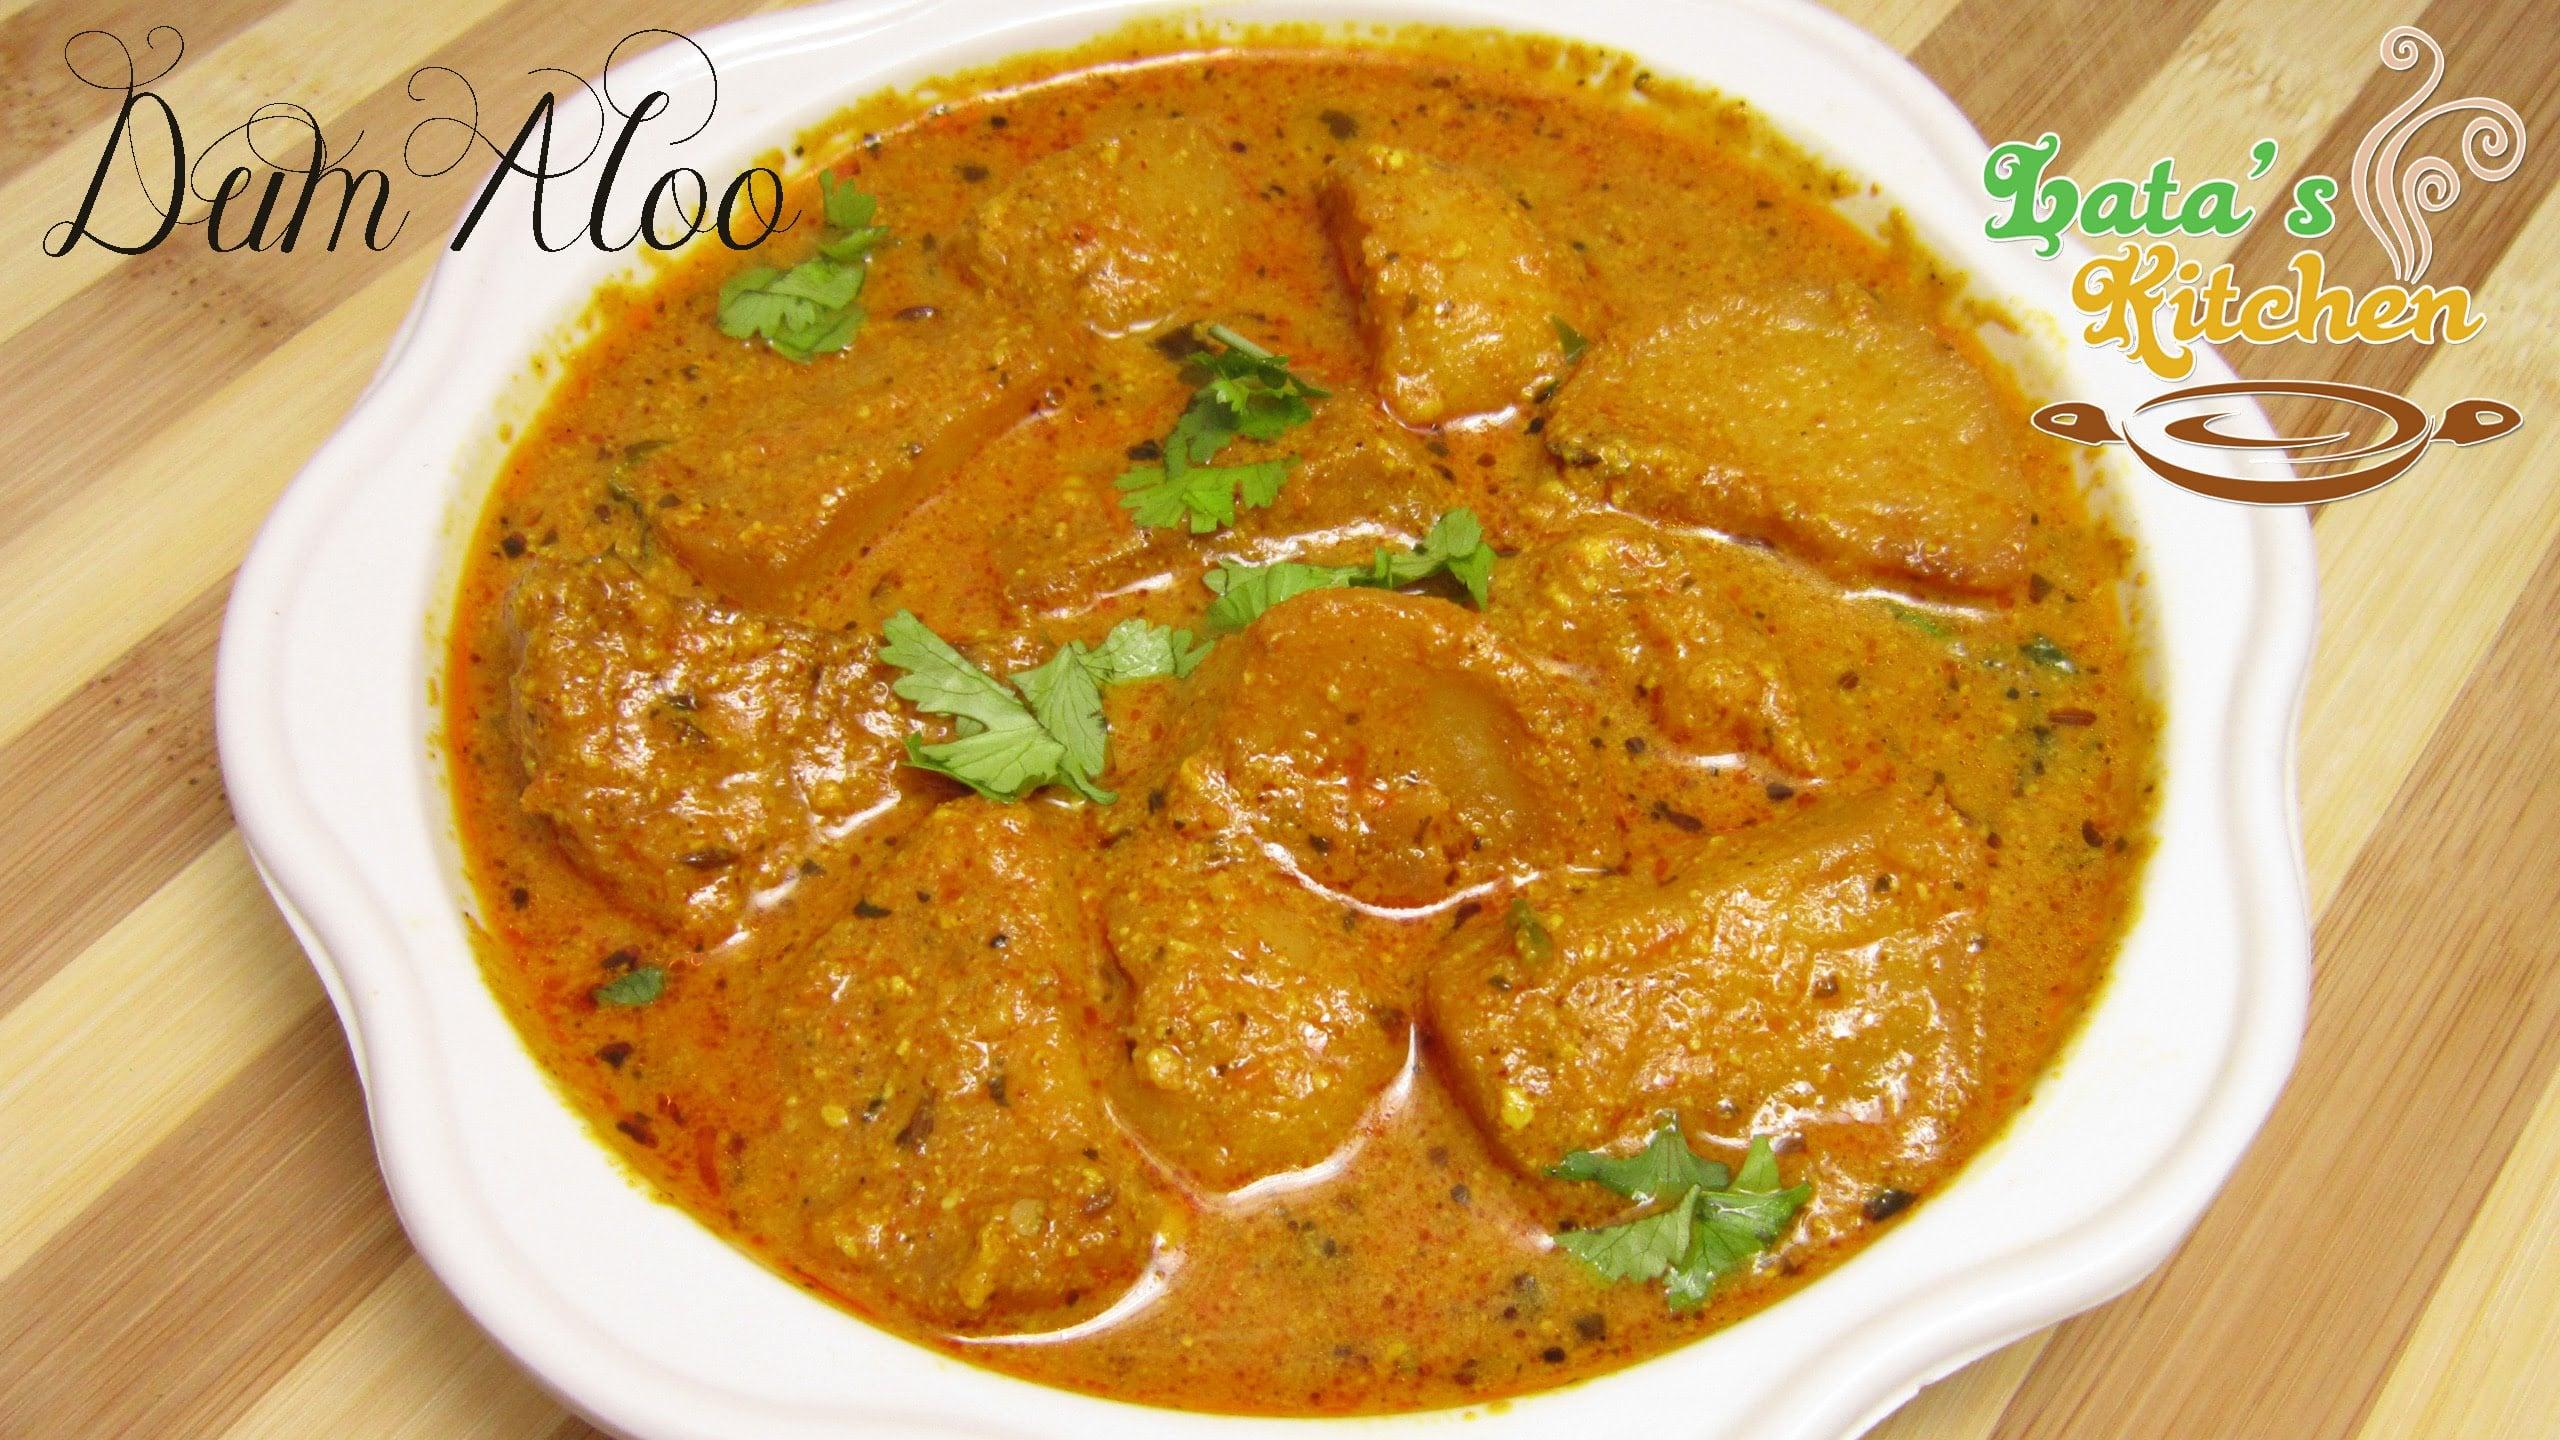 Dum Aloo Recipe — Indian Vegetarian Recipe Video in Hindi with English Subtitles